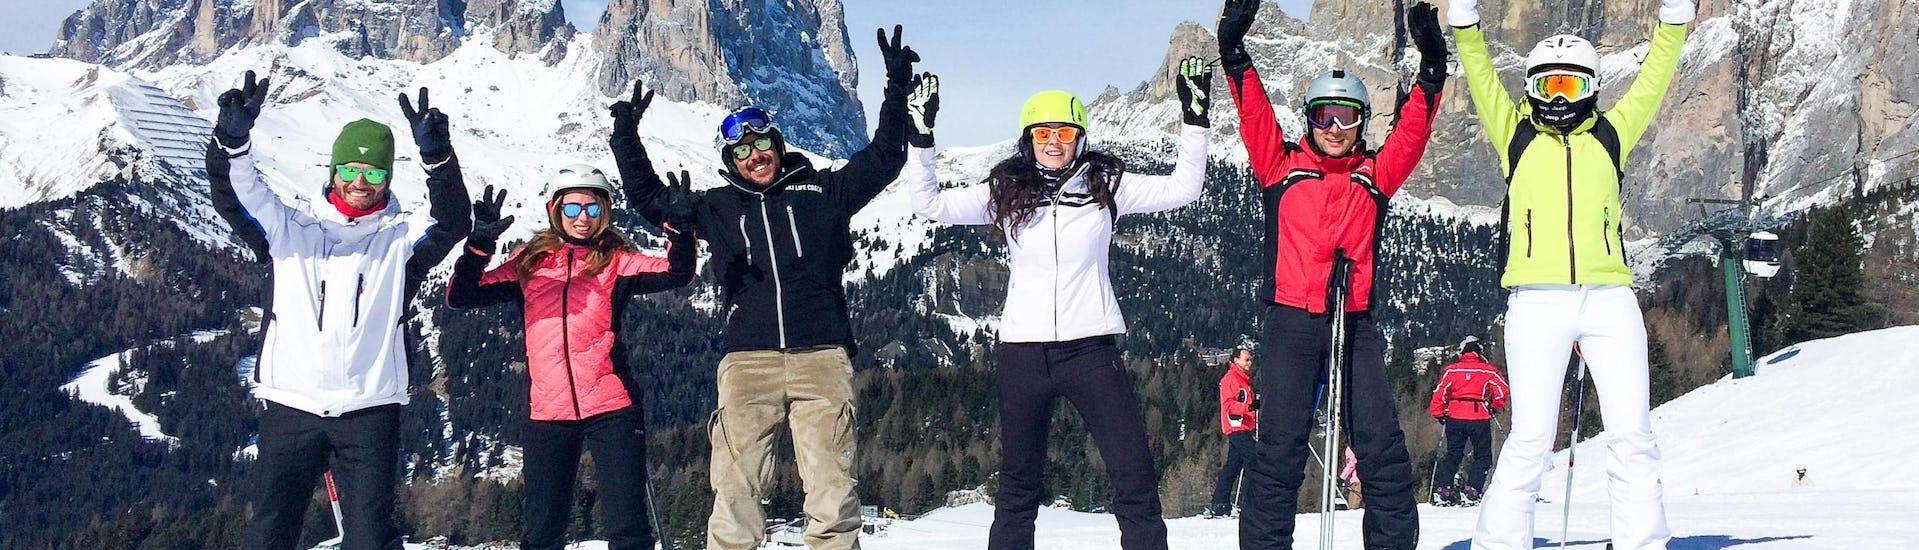 "Private Ski Lesson ""A day with your Ski Life Coach"""